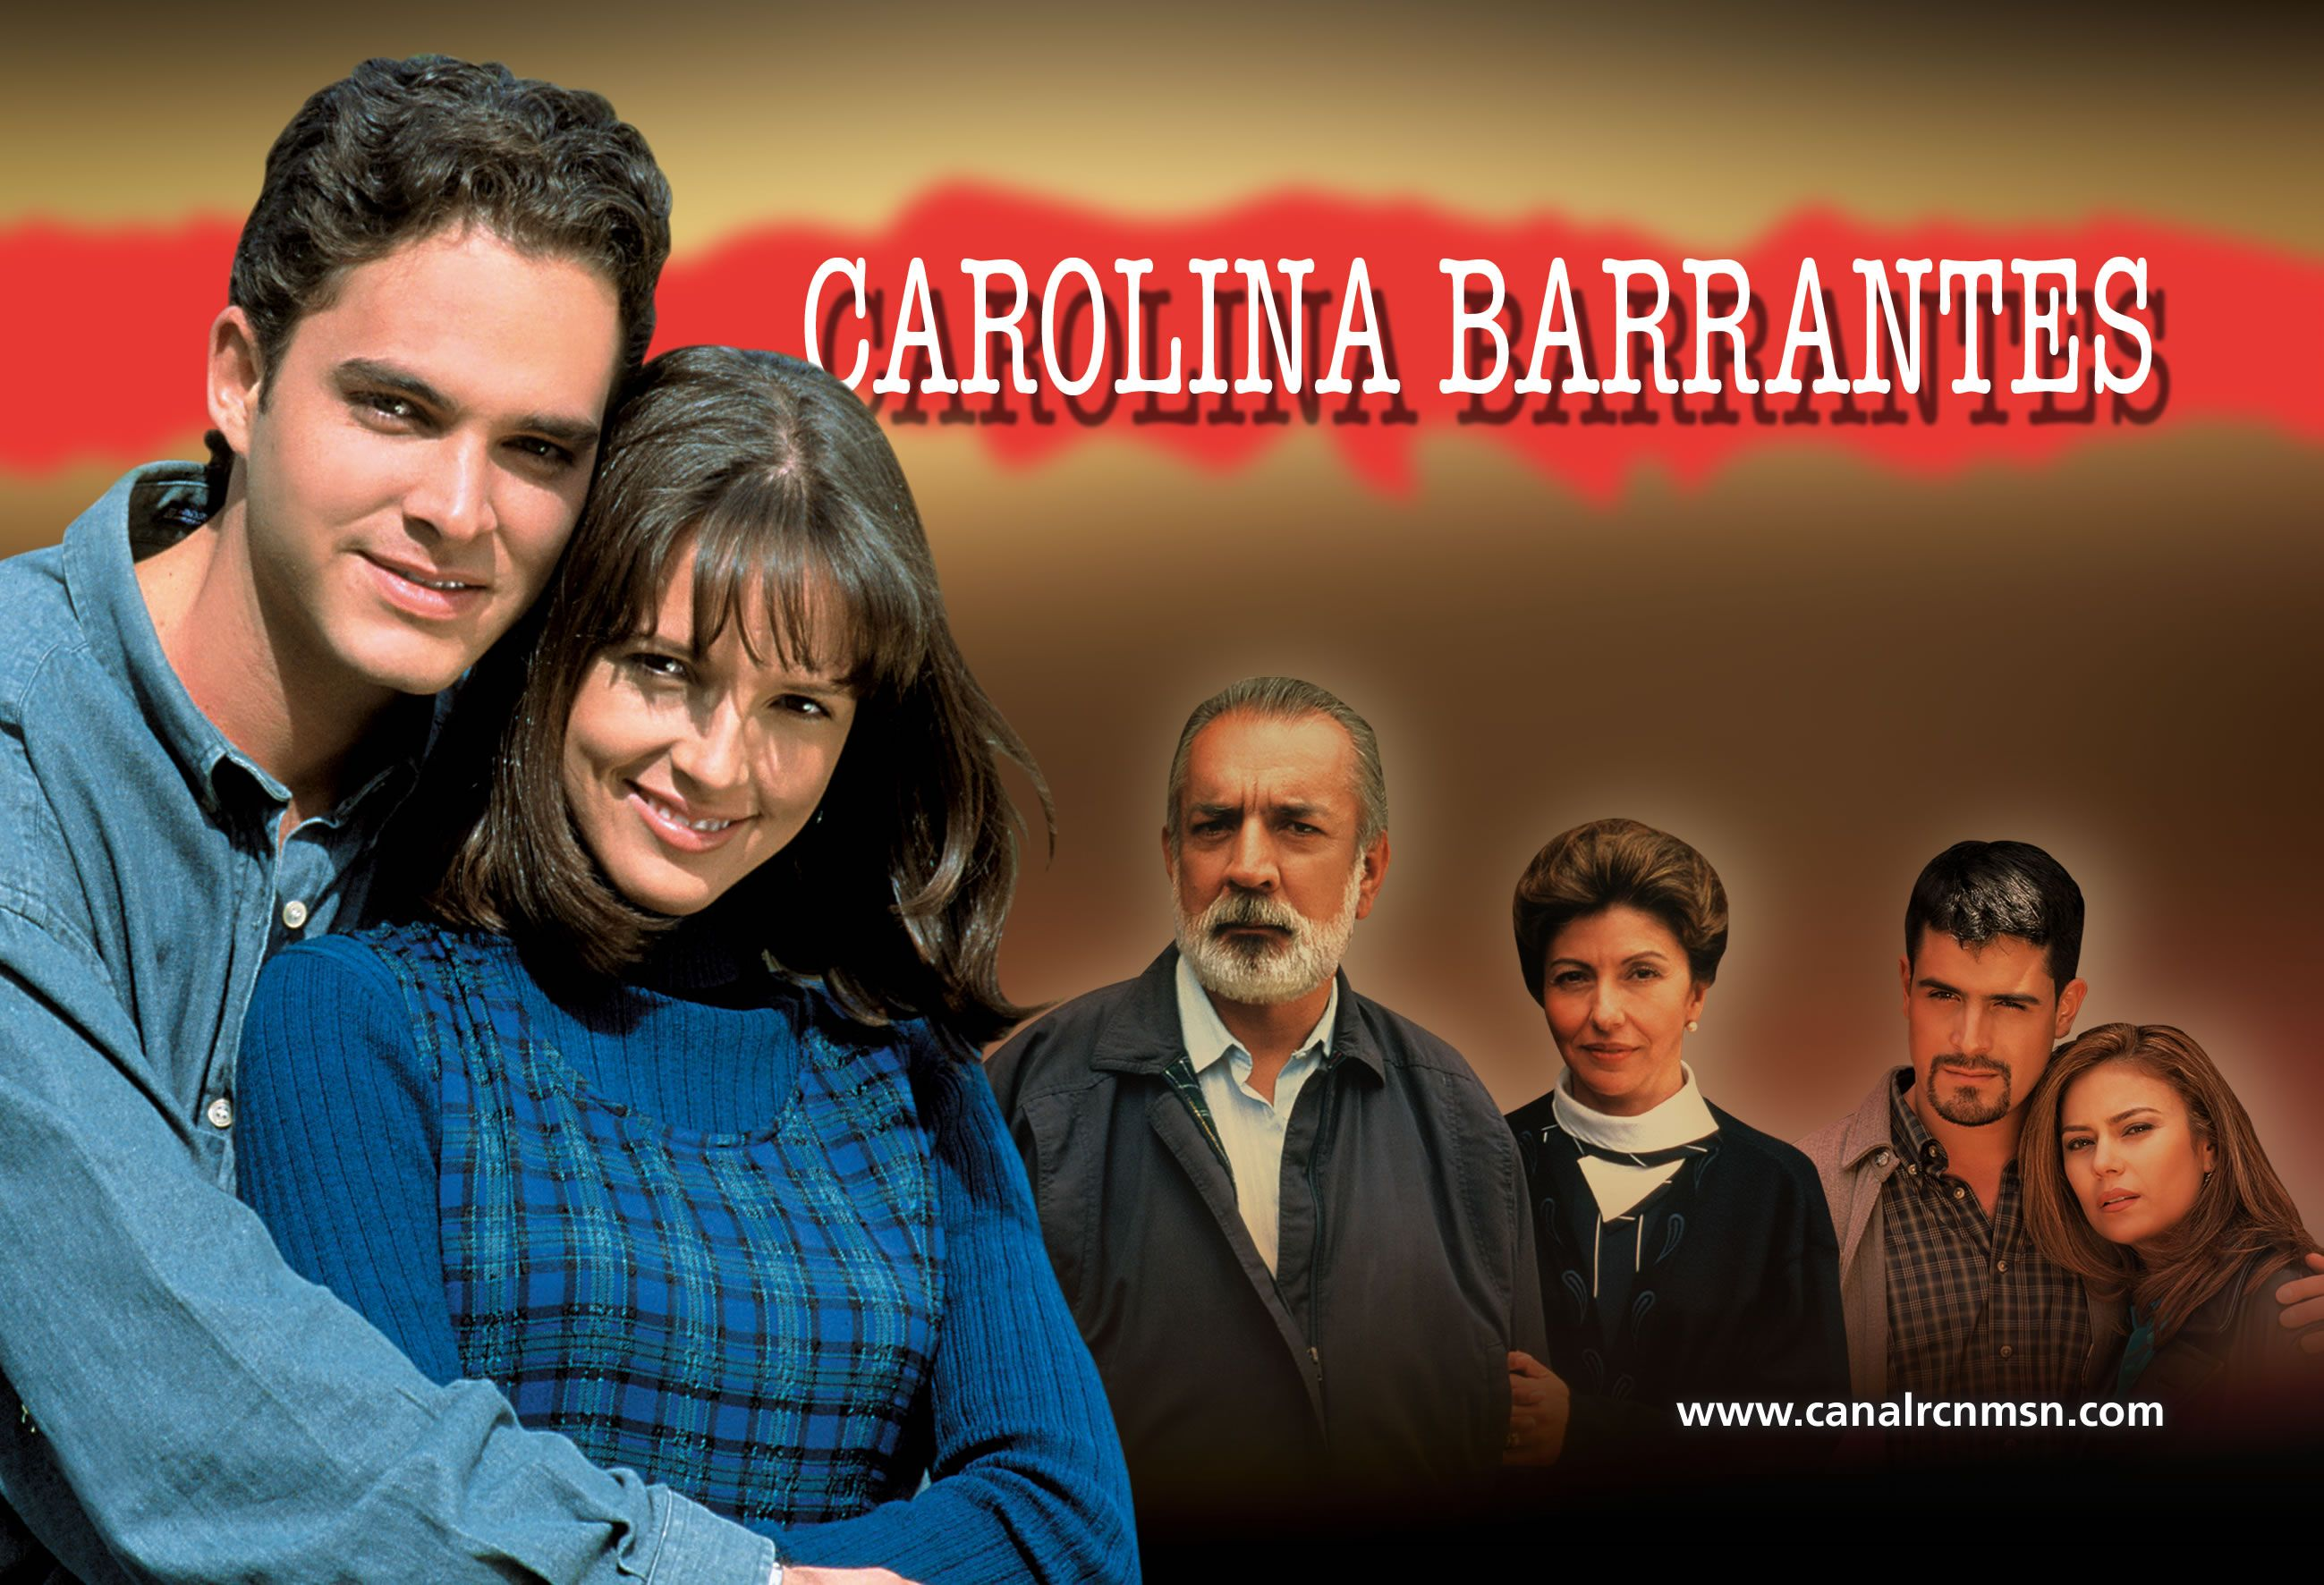 Carolina Barrantes (1999)